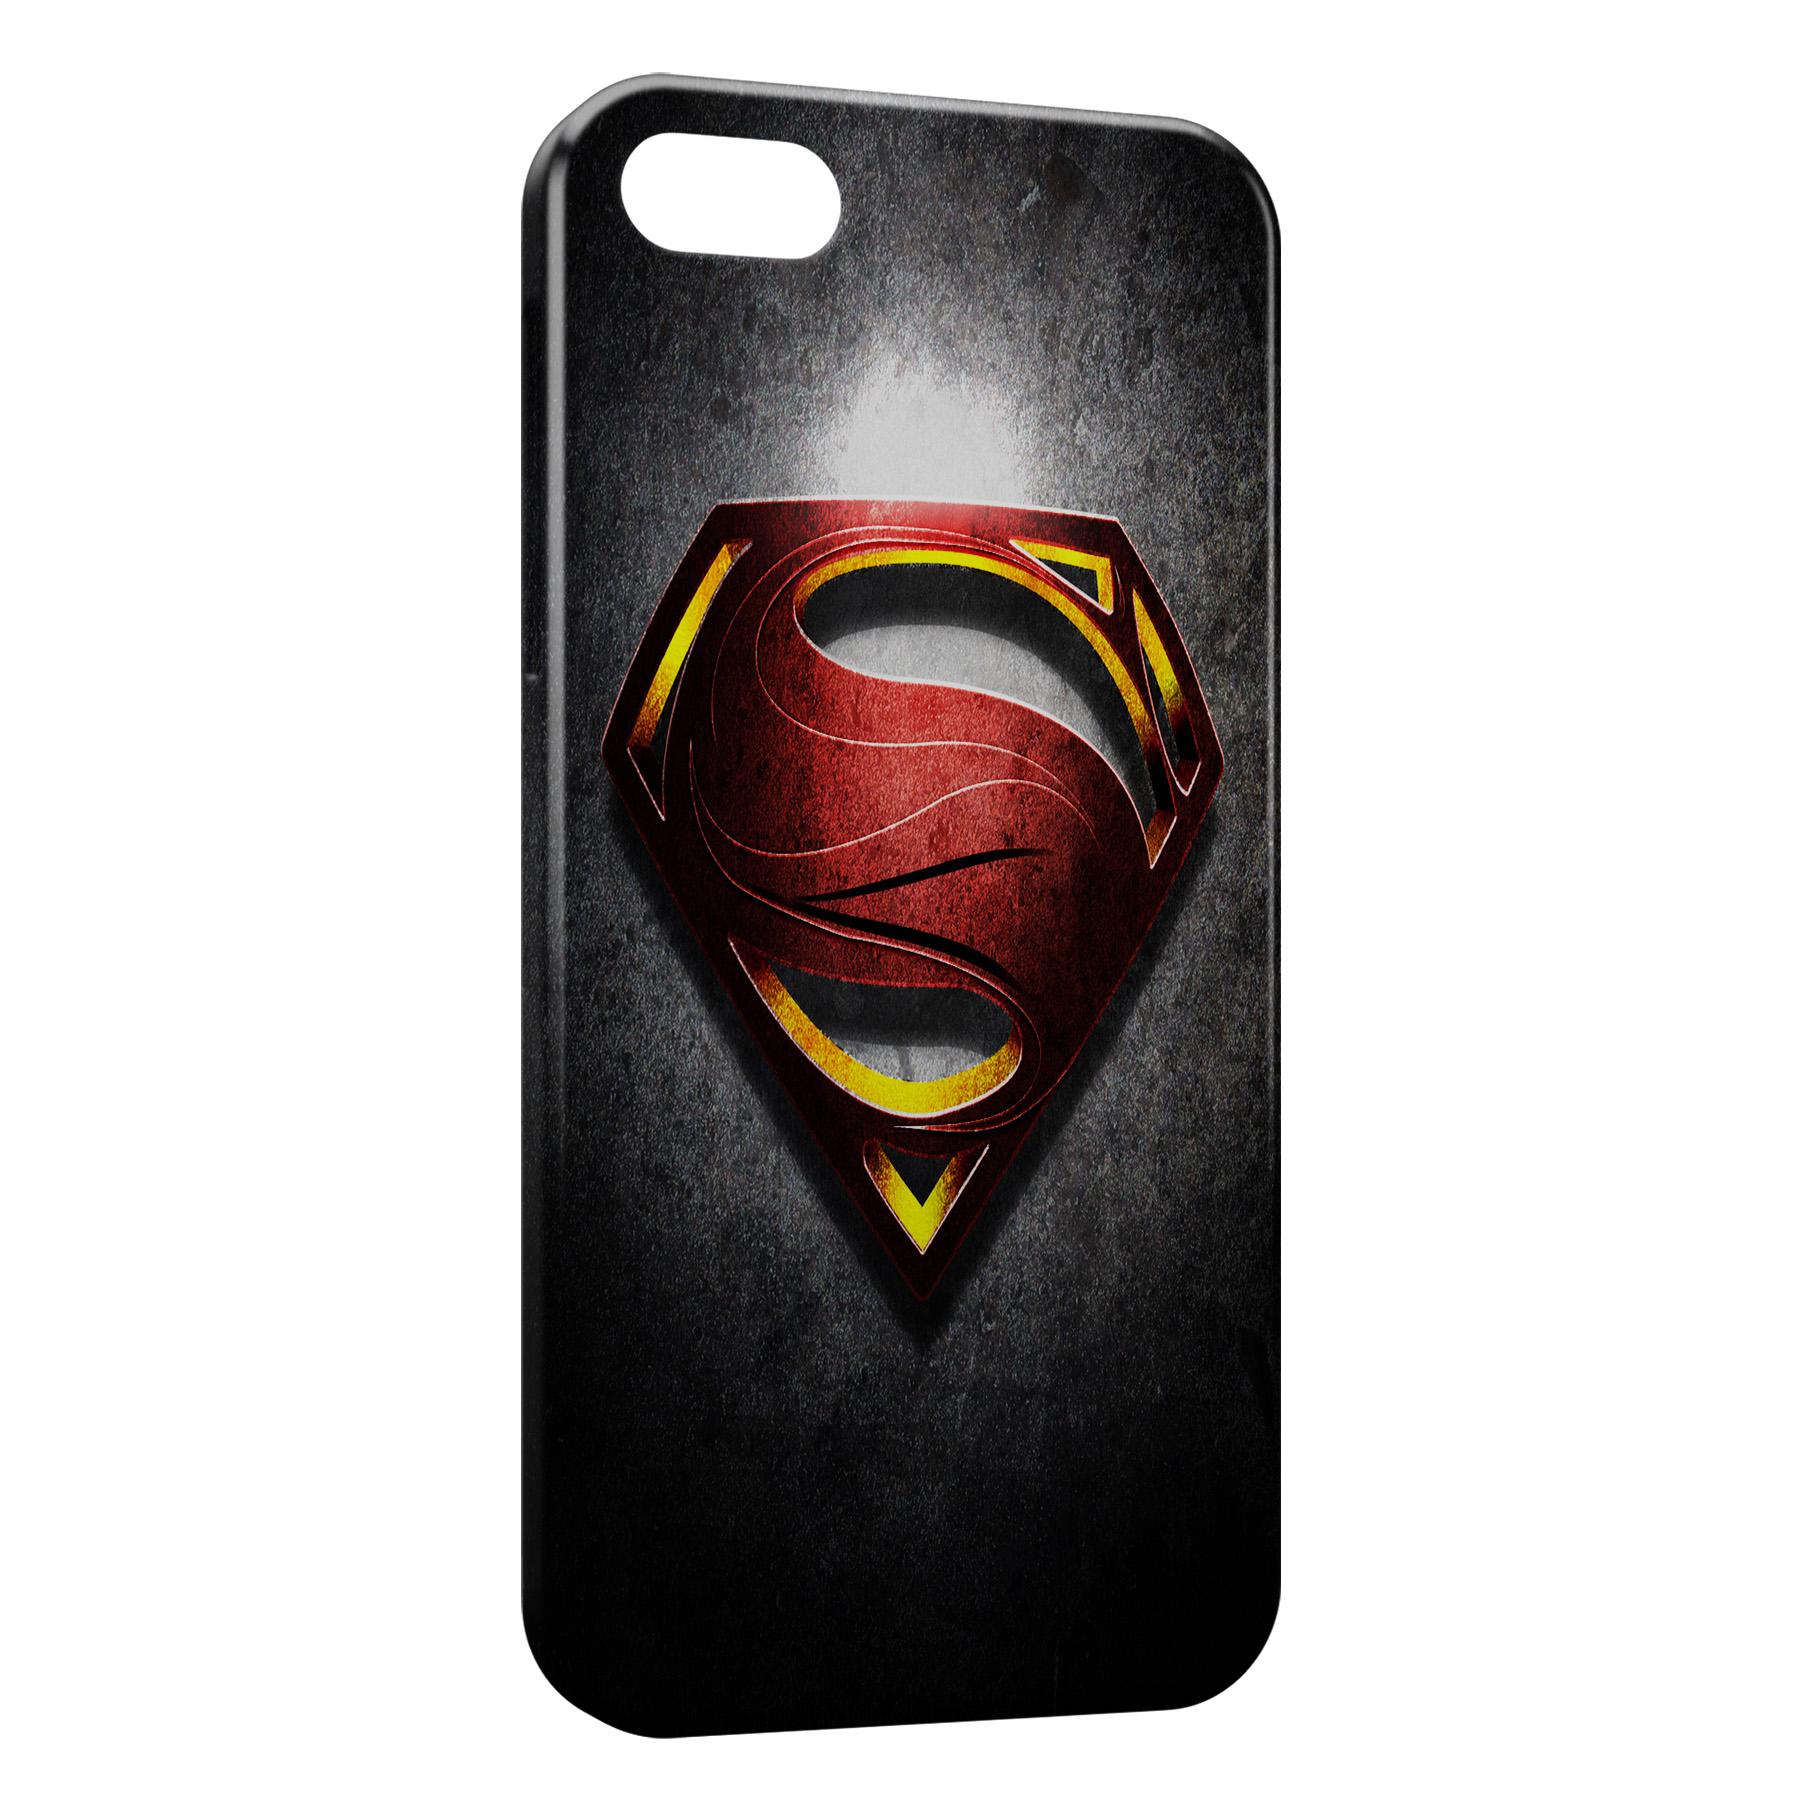 Coque iPhone 6 6S Superman